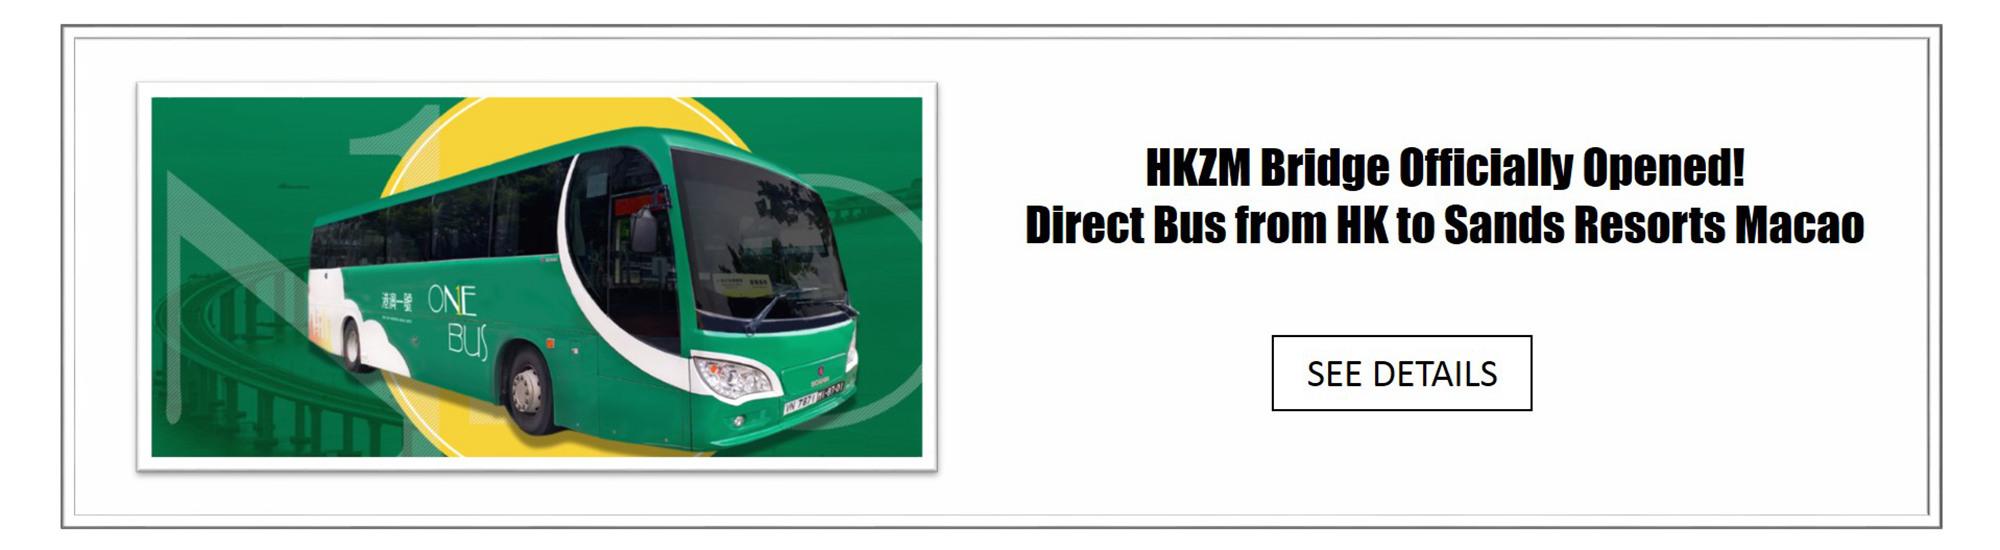 Macau Transportation Macau Transportation Introduction